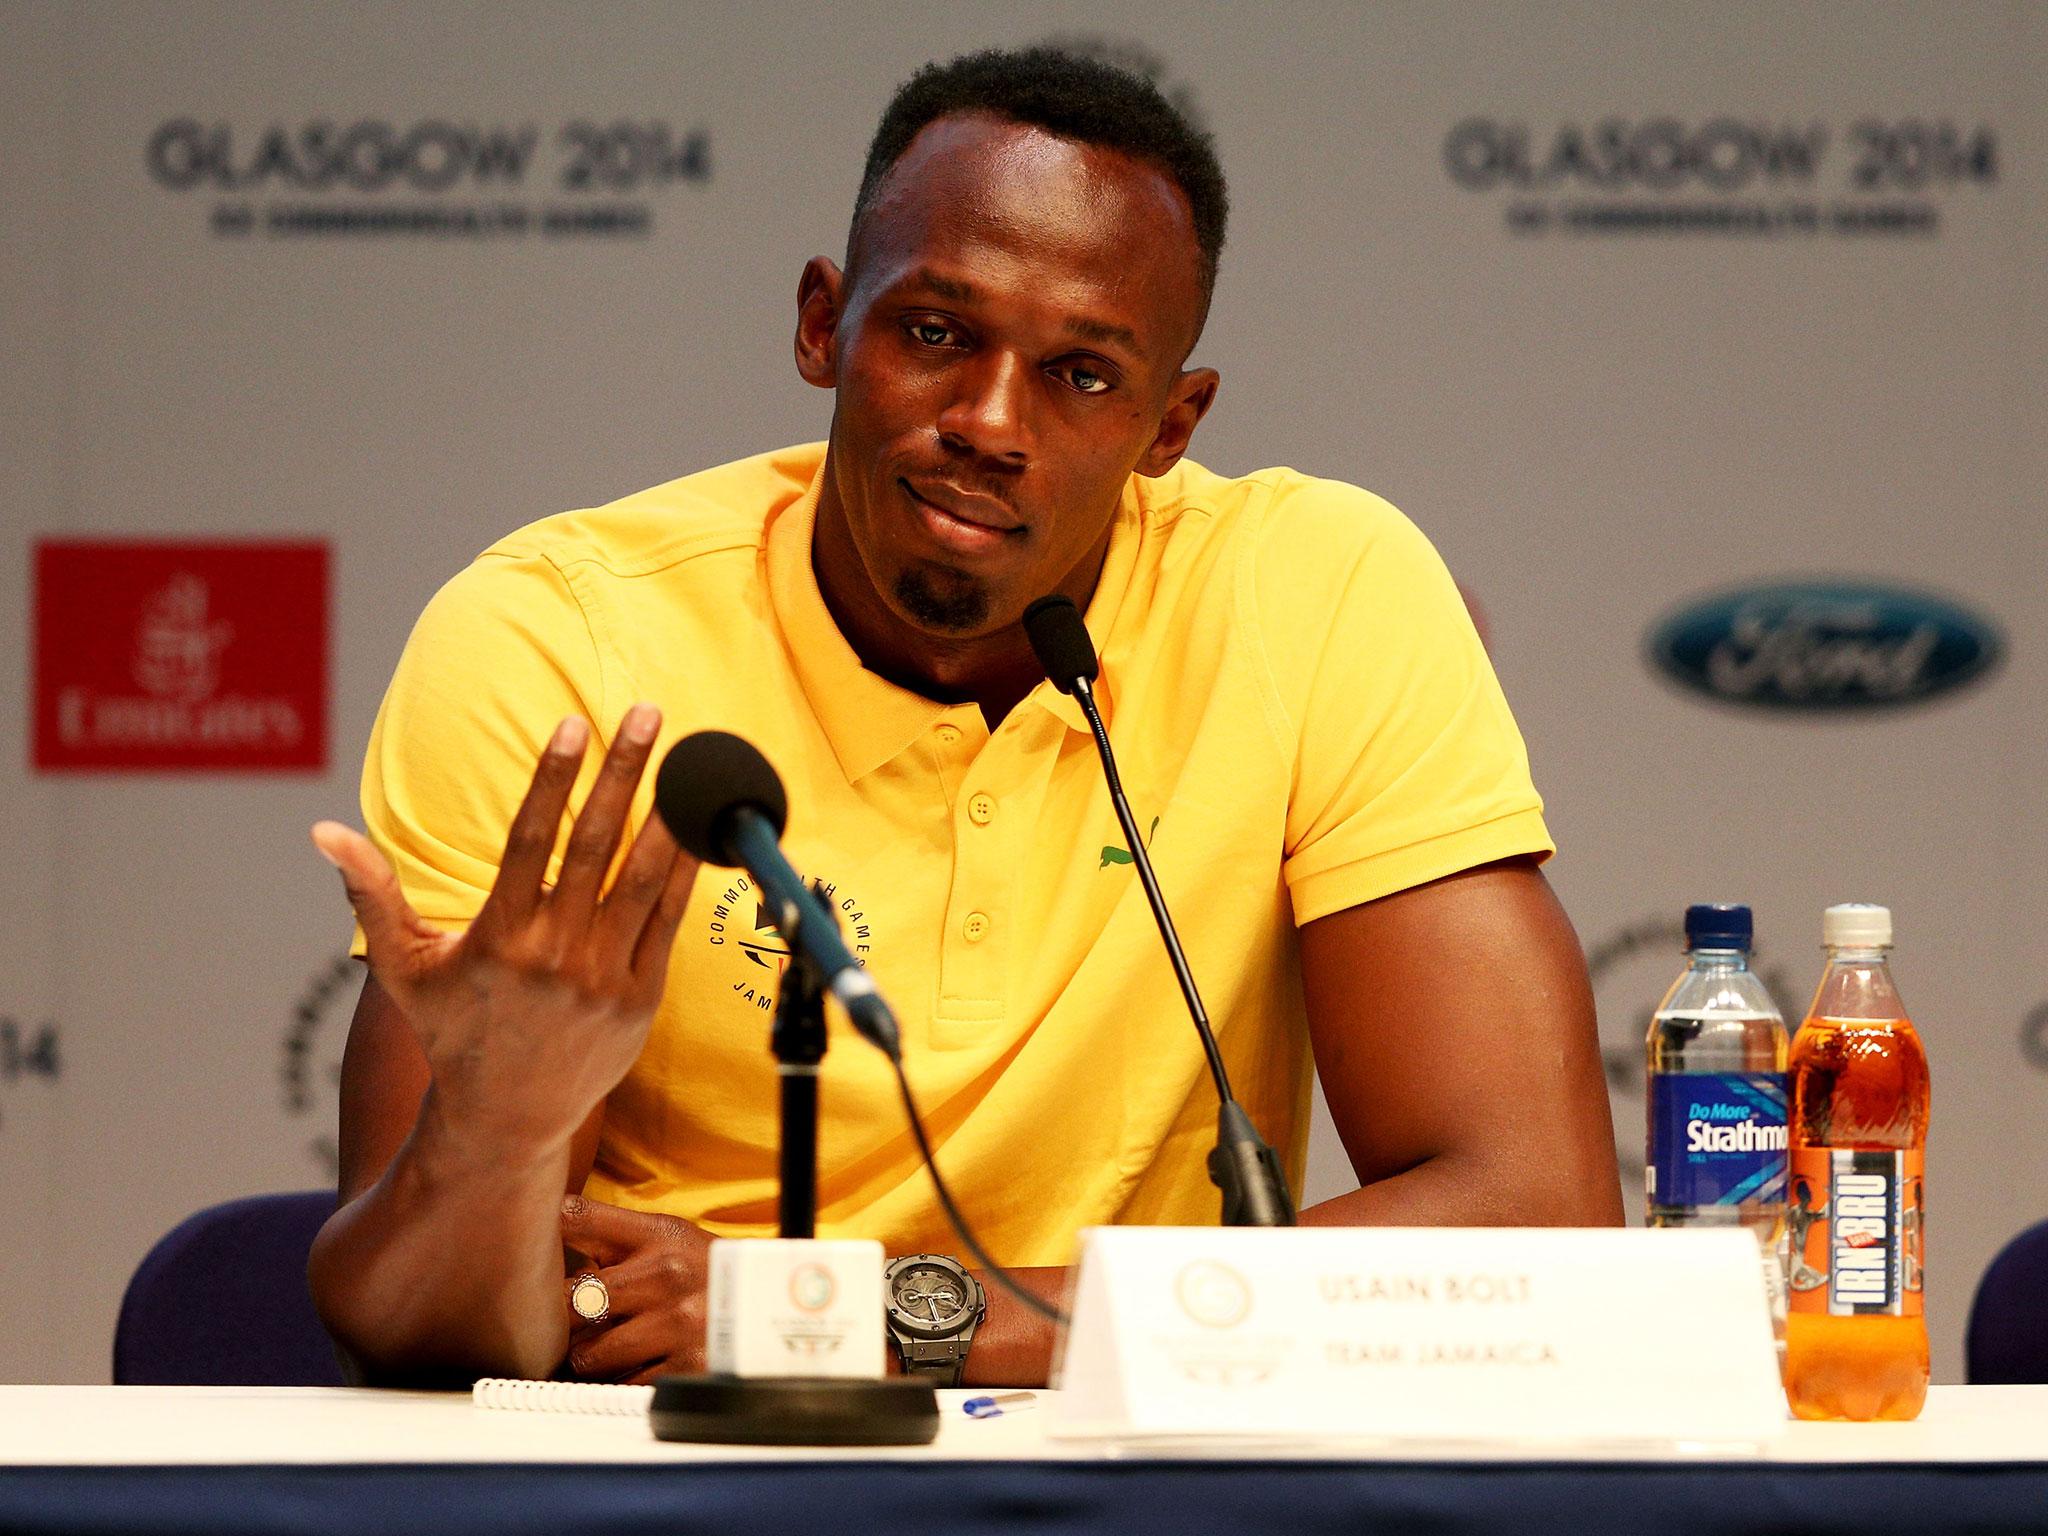 Cinco cosas de Usain Bolt que te van a asombrar más que sus récords